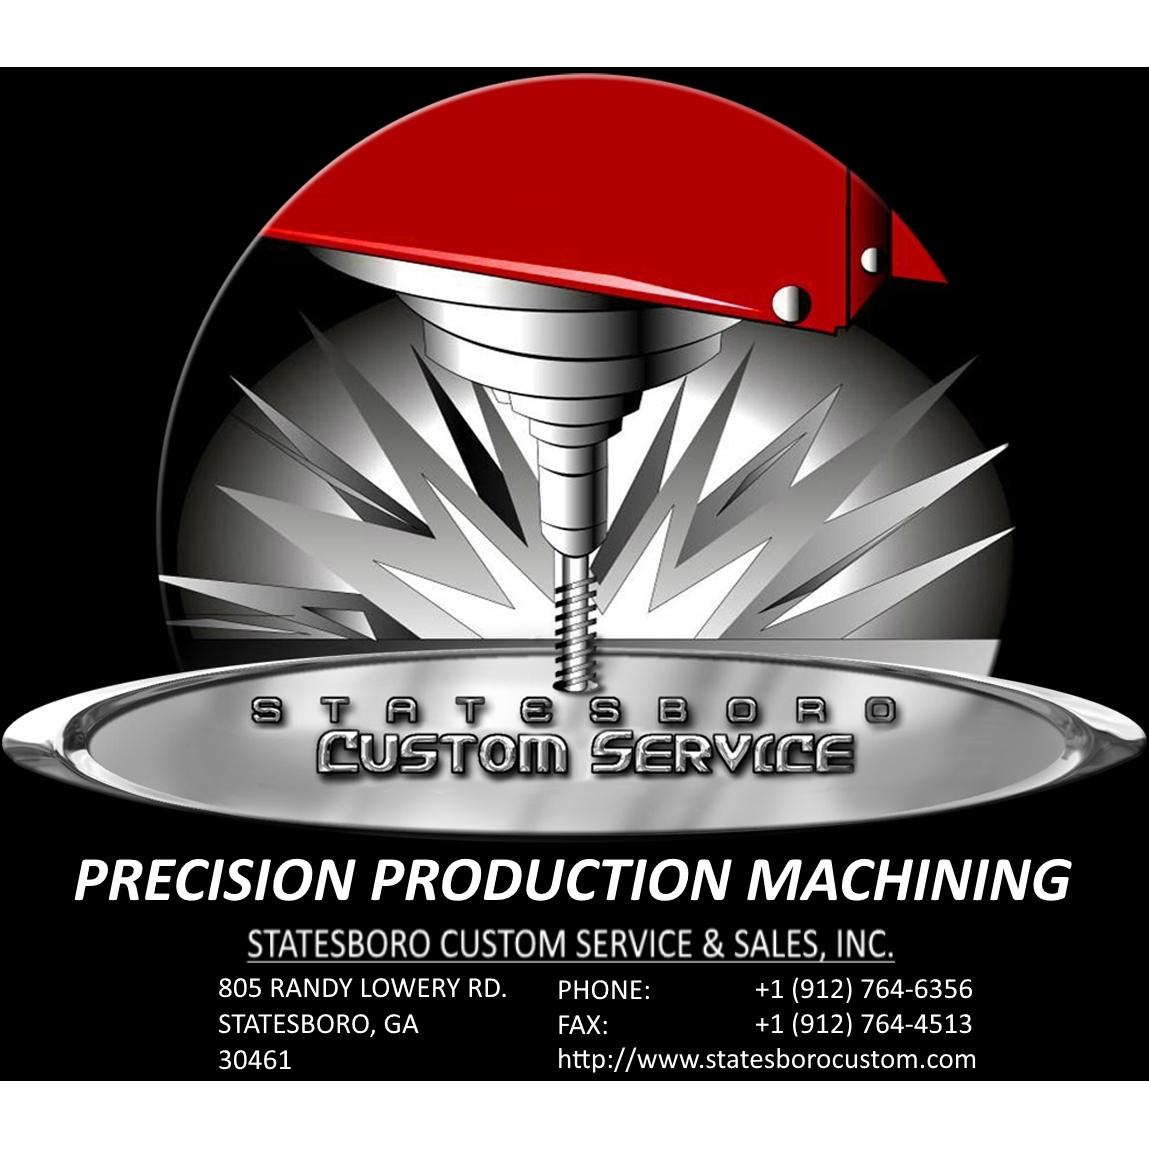 Statesboro Custom Service & Sales, Inc.